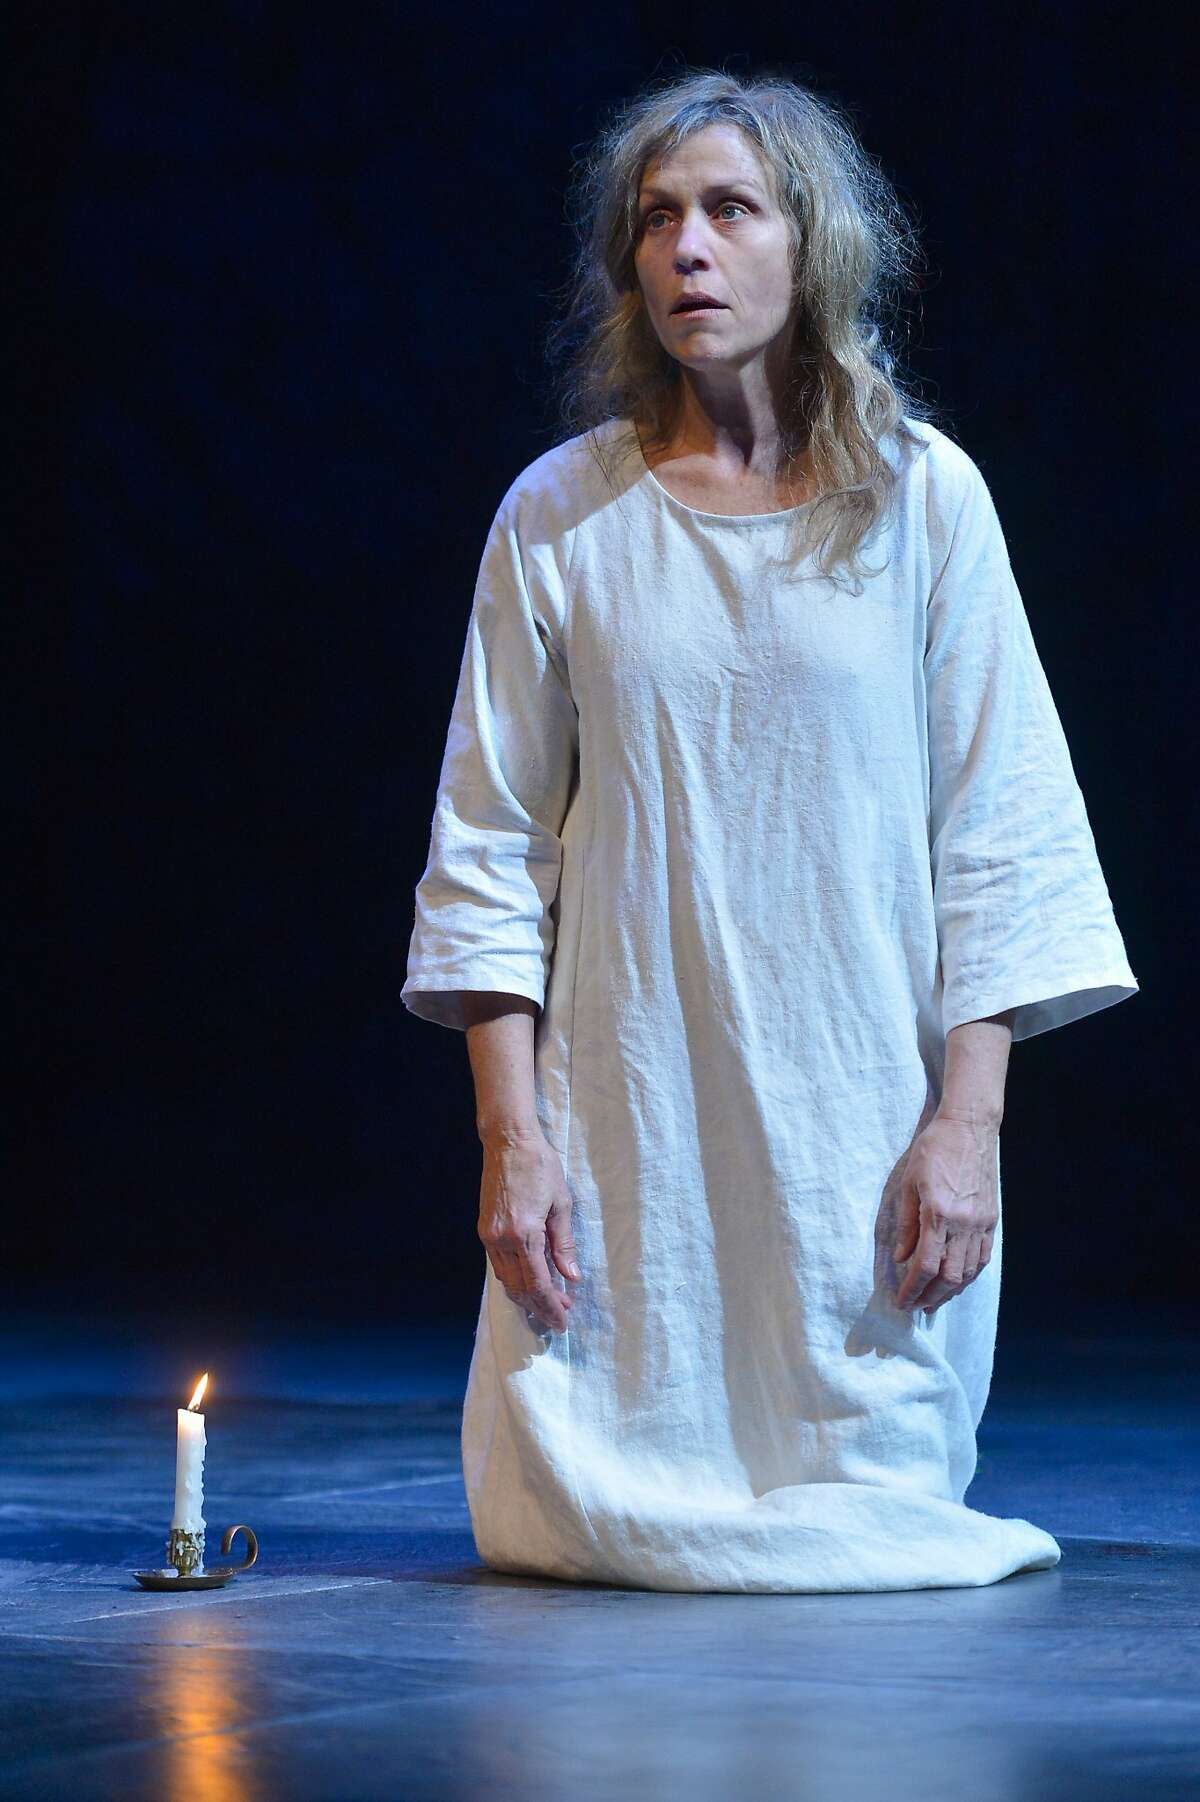 Lady Macbeth (Frances McDormand) walks and talks in her sleep in